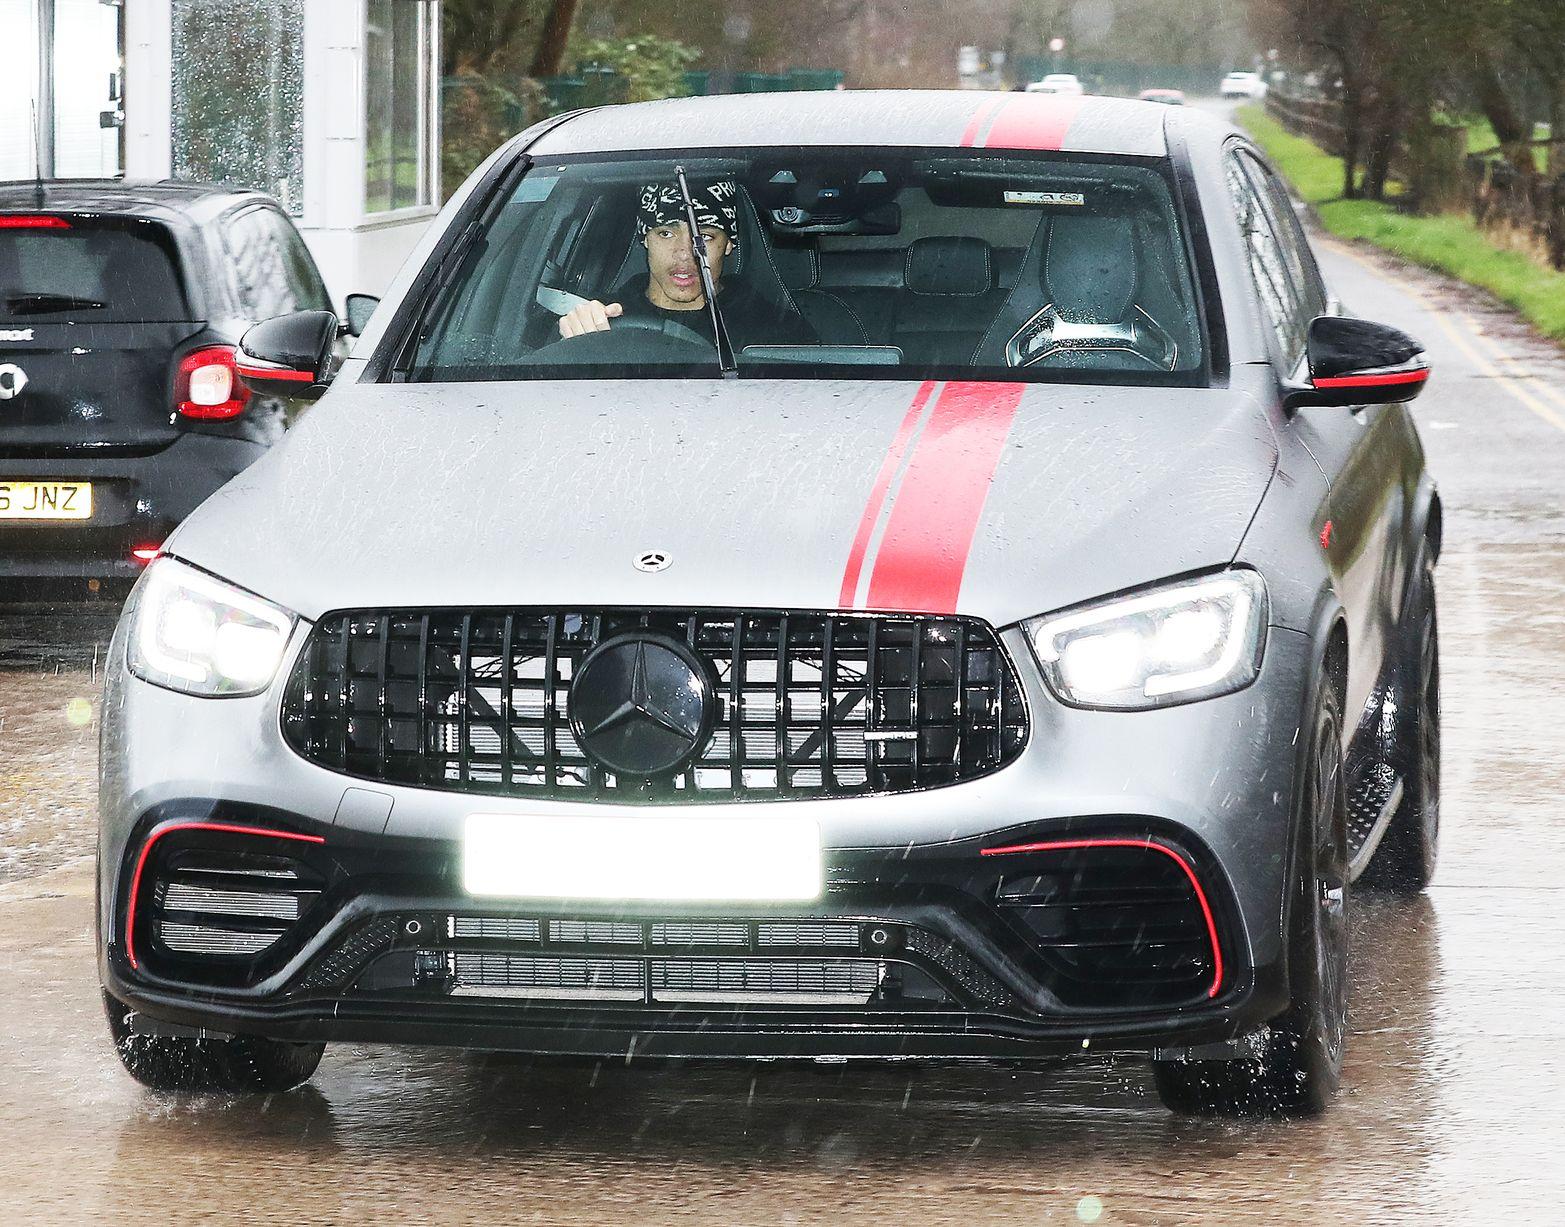 Sir Alex Ferguson arrives at Manchester United training ground after Club Brugge win - Bóng Đá